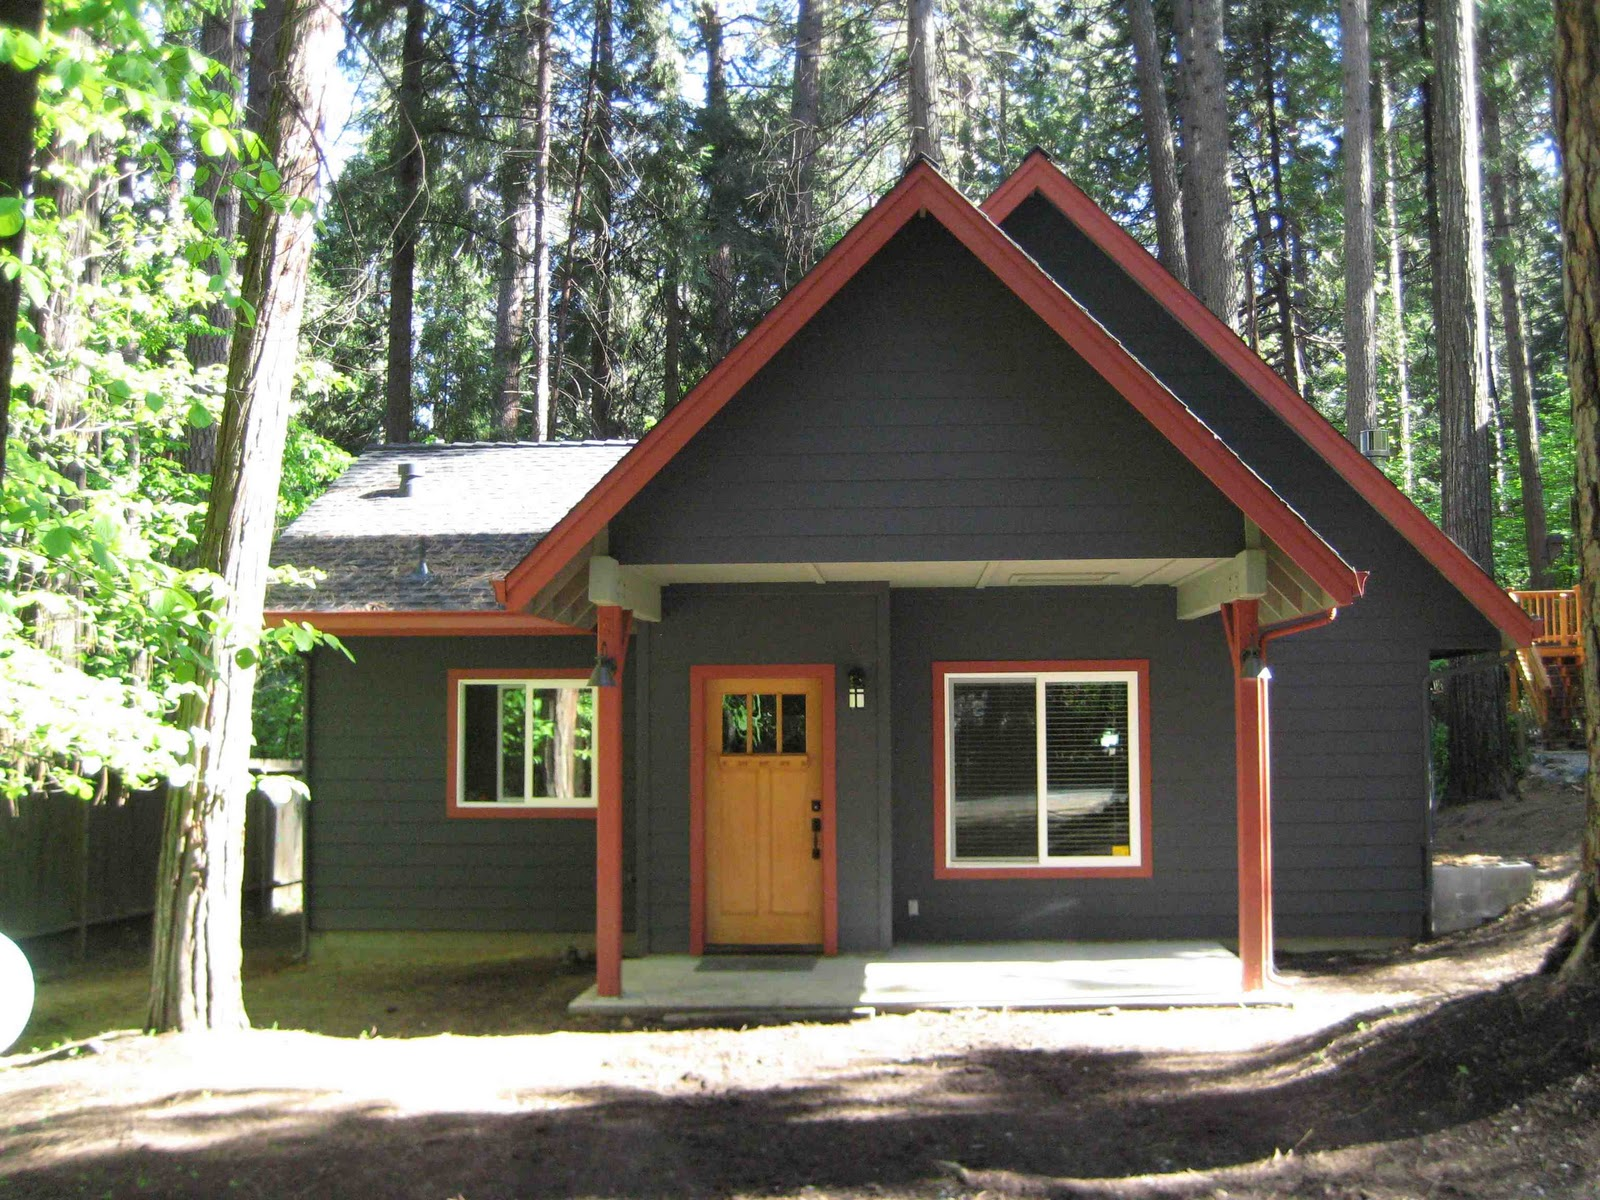 results for log cabin interior paint colors. Black Bedroom Furniture Sets. Home Design Ideas